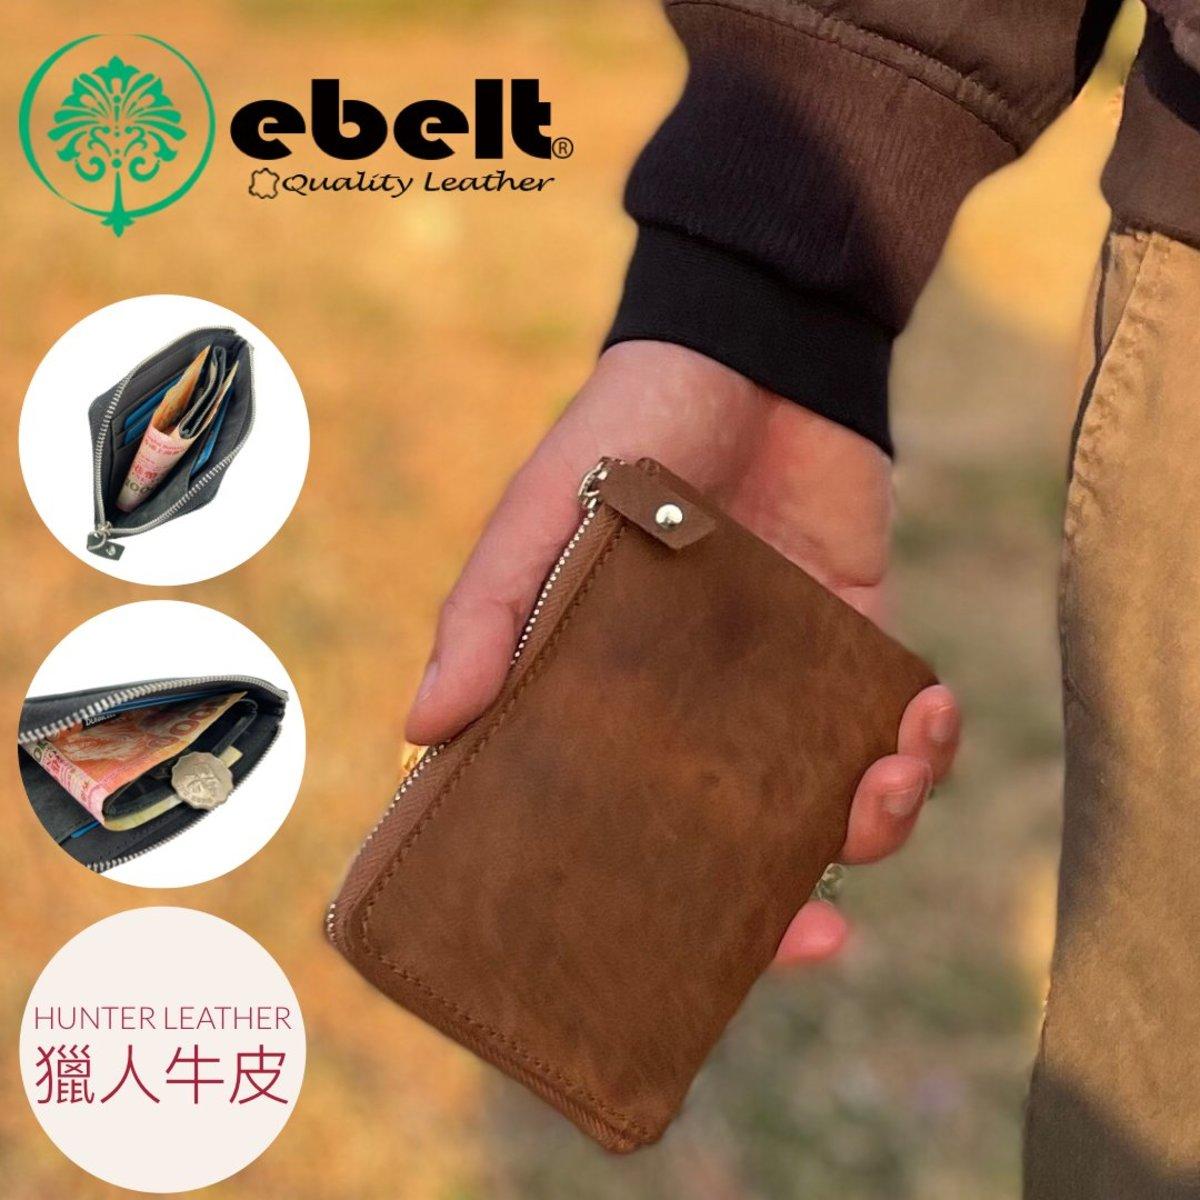 ebelt Full Grain Buffalo Hunter Series Leather Zipper Wallet - WM0111R